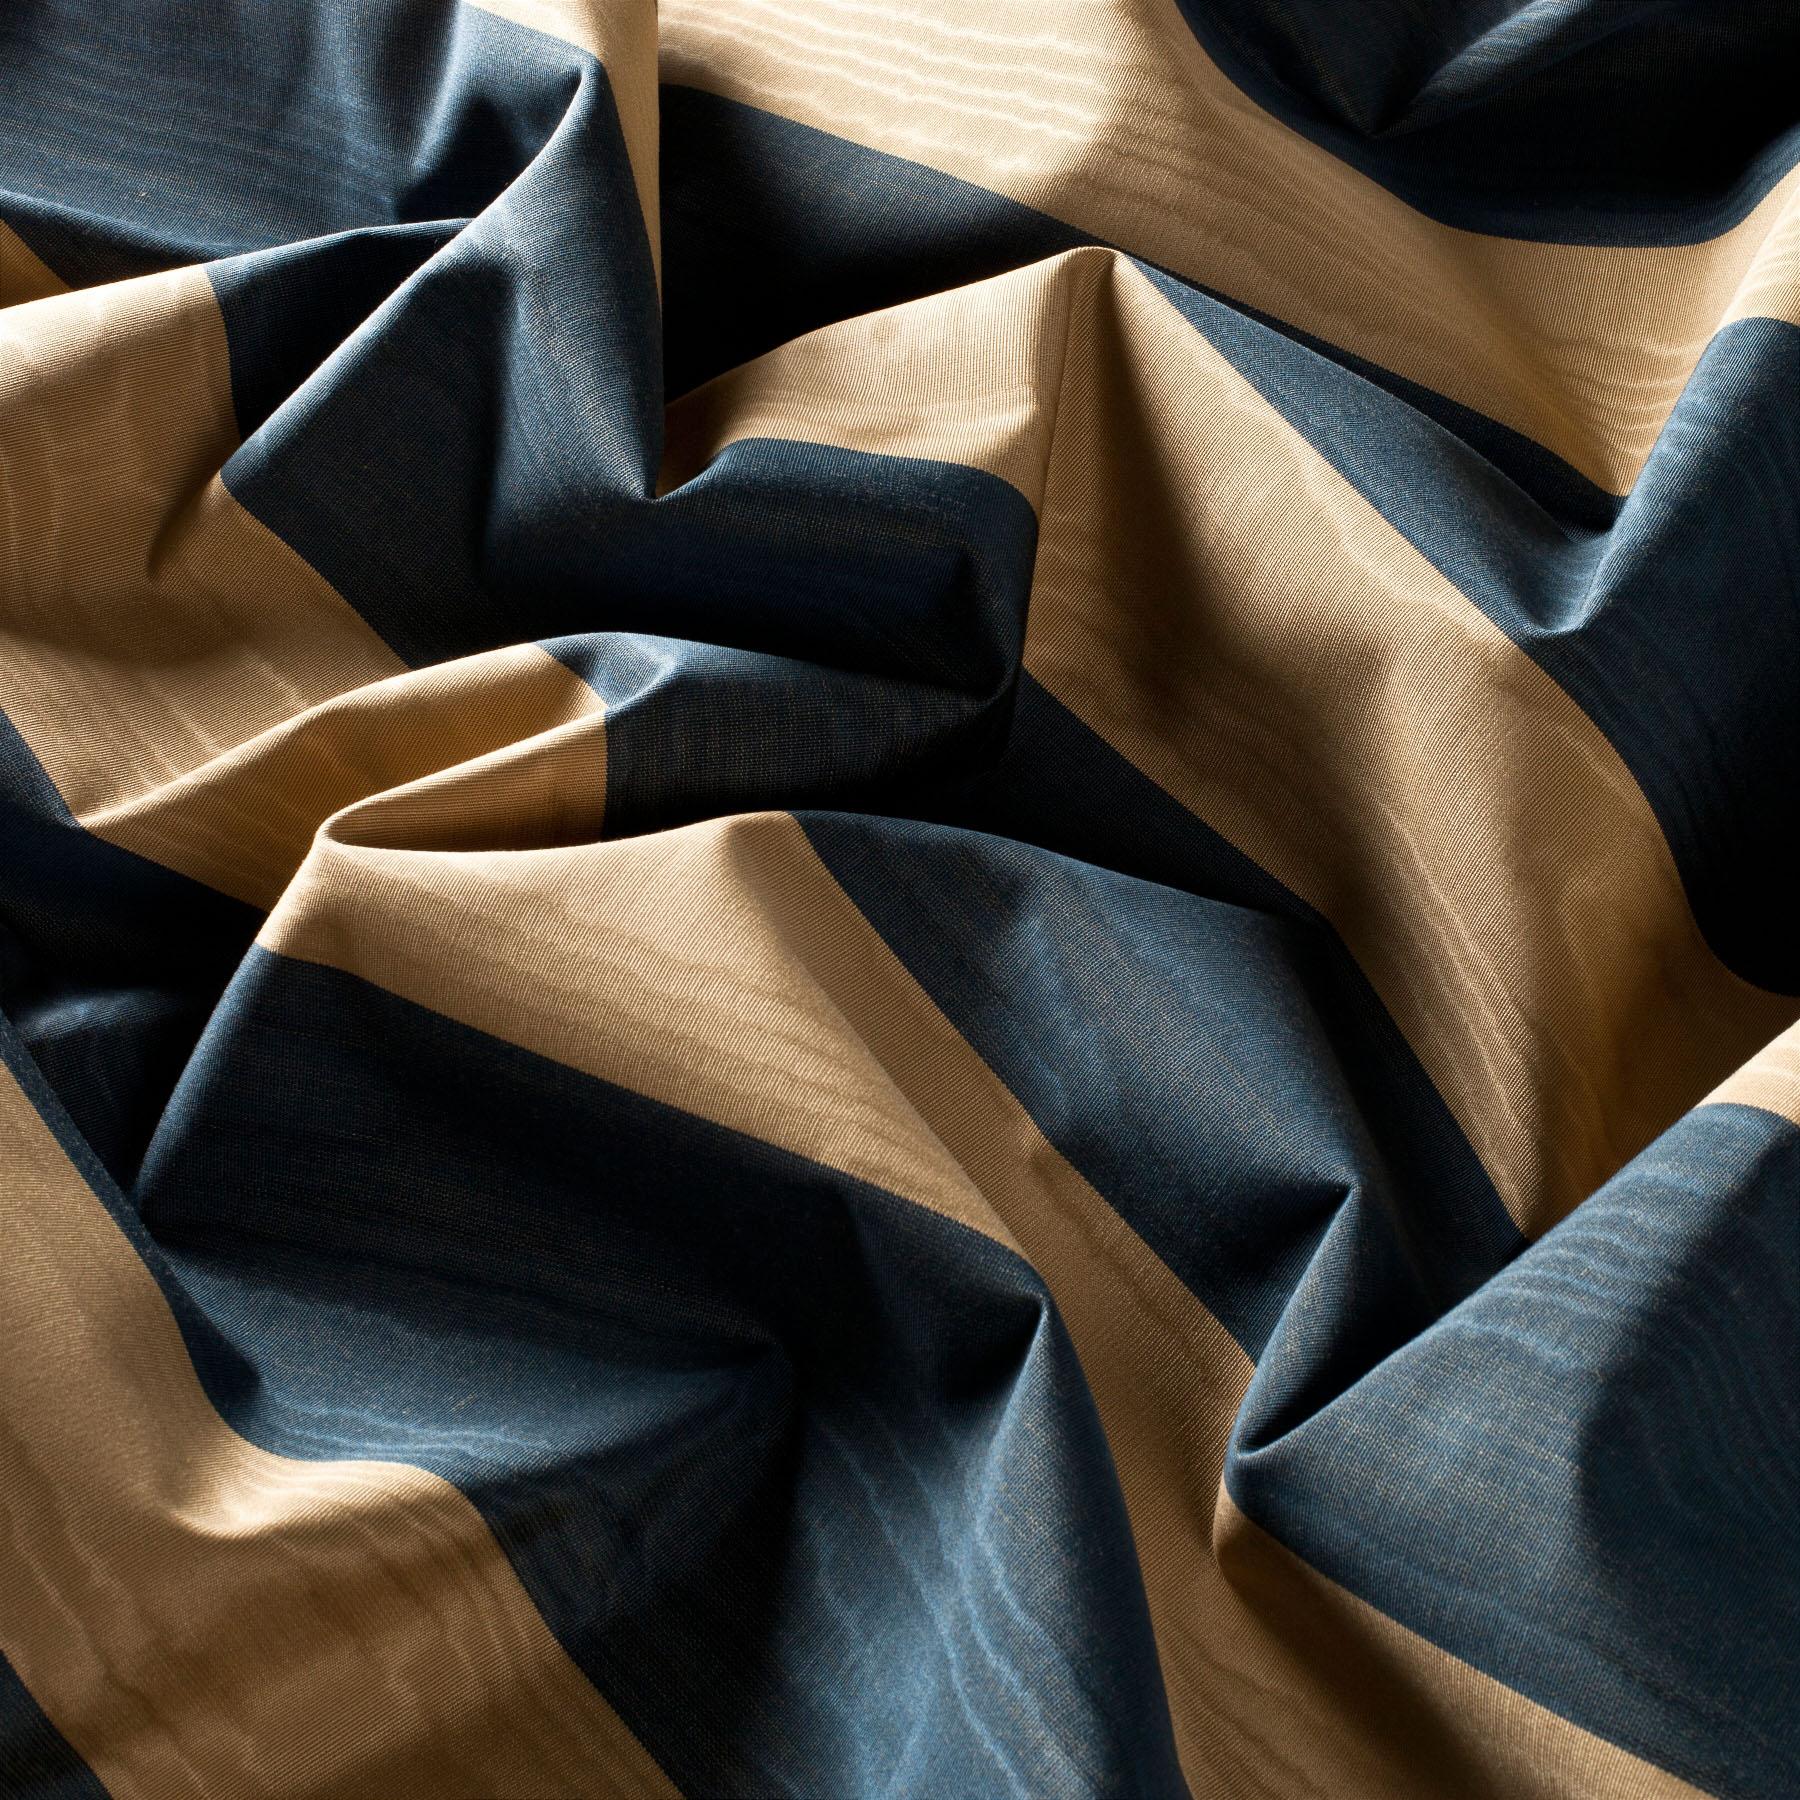 decoration fabric aronia 9 7105 258 jab anstoetz fabrics. Black Bedroom Furniture Sets. Home Design Ideas